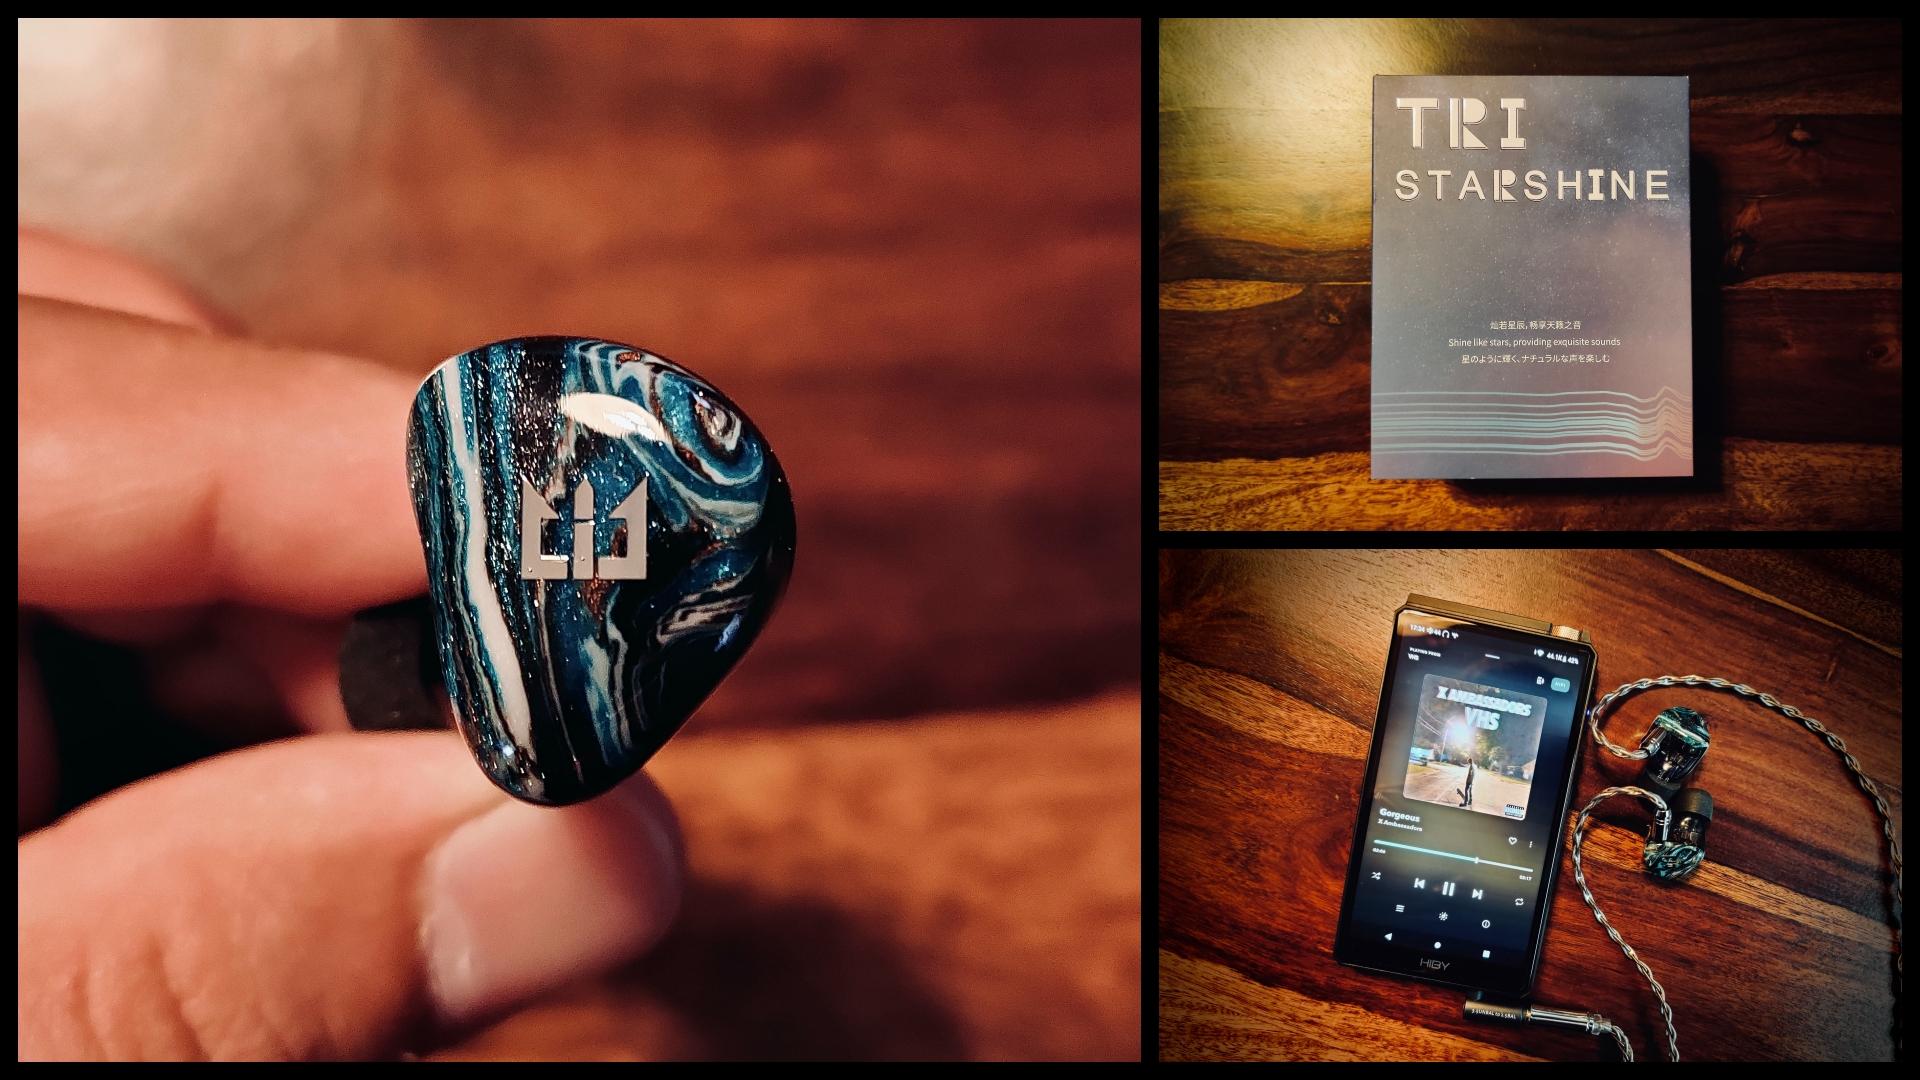 TRI Starshine Featured Image.jpg